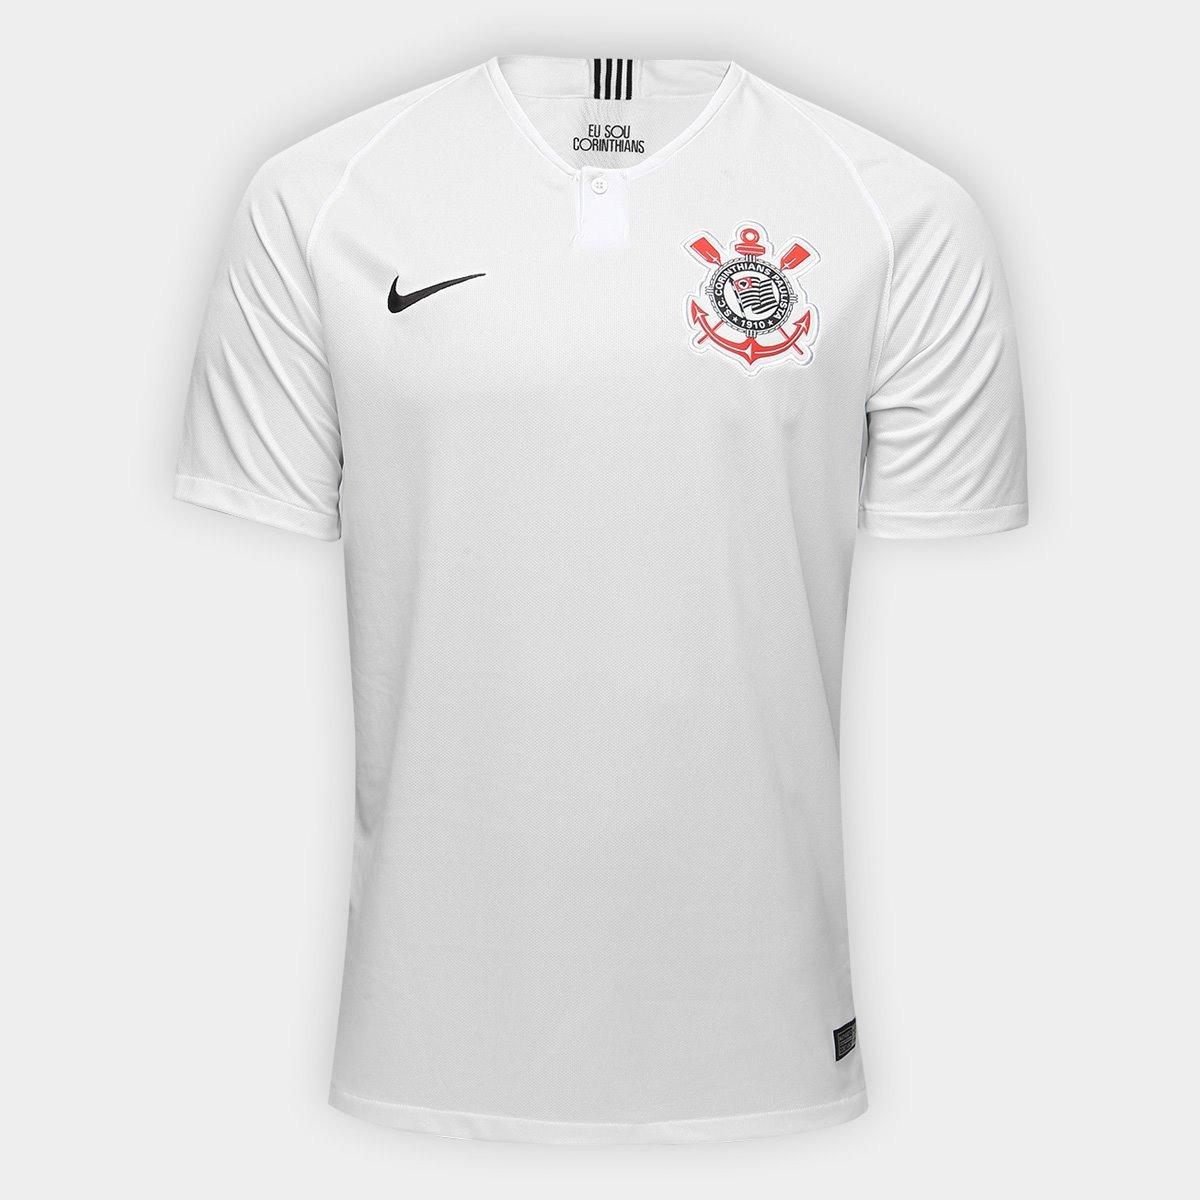 camisa nike corinthians 2018 2019 i branca. Carregando zoom. 7c7bfee0da133